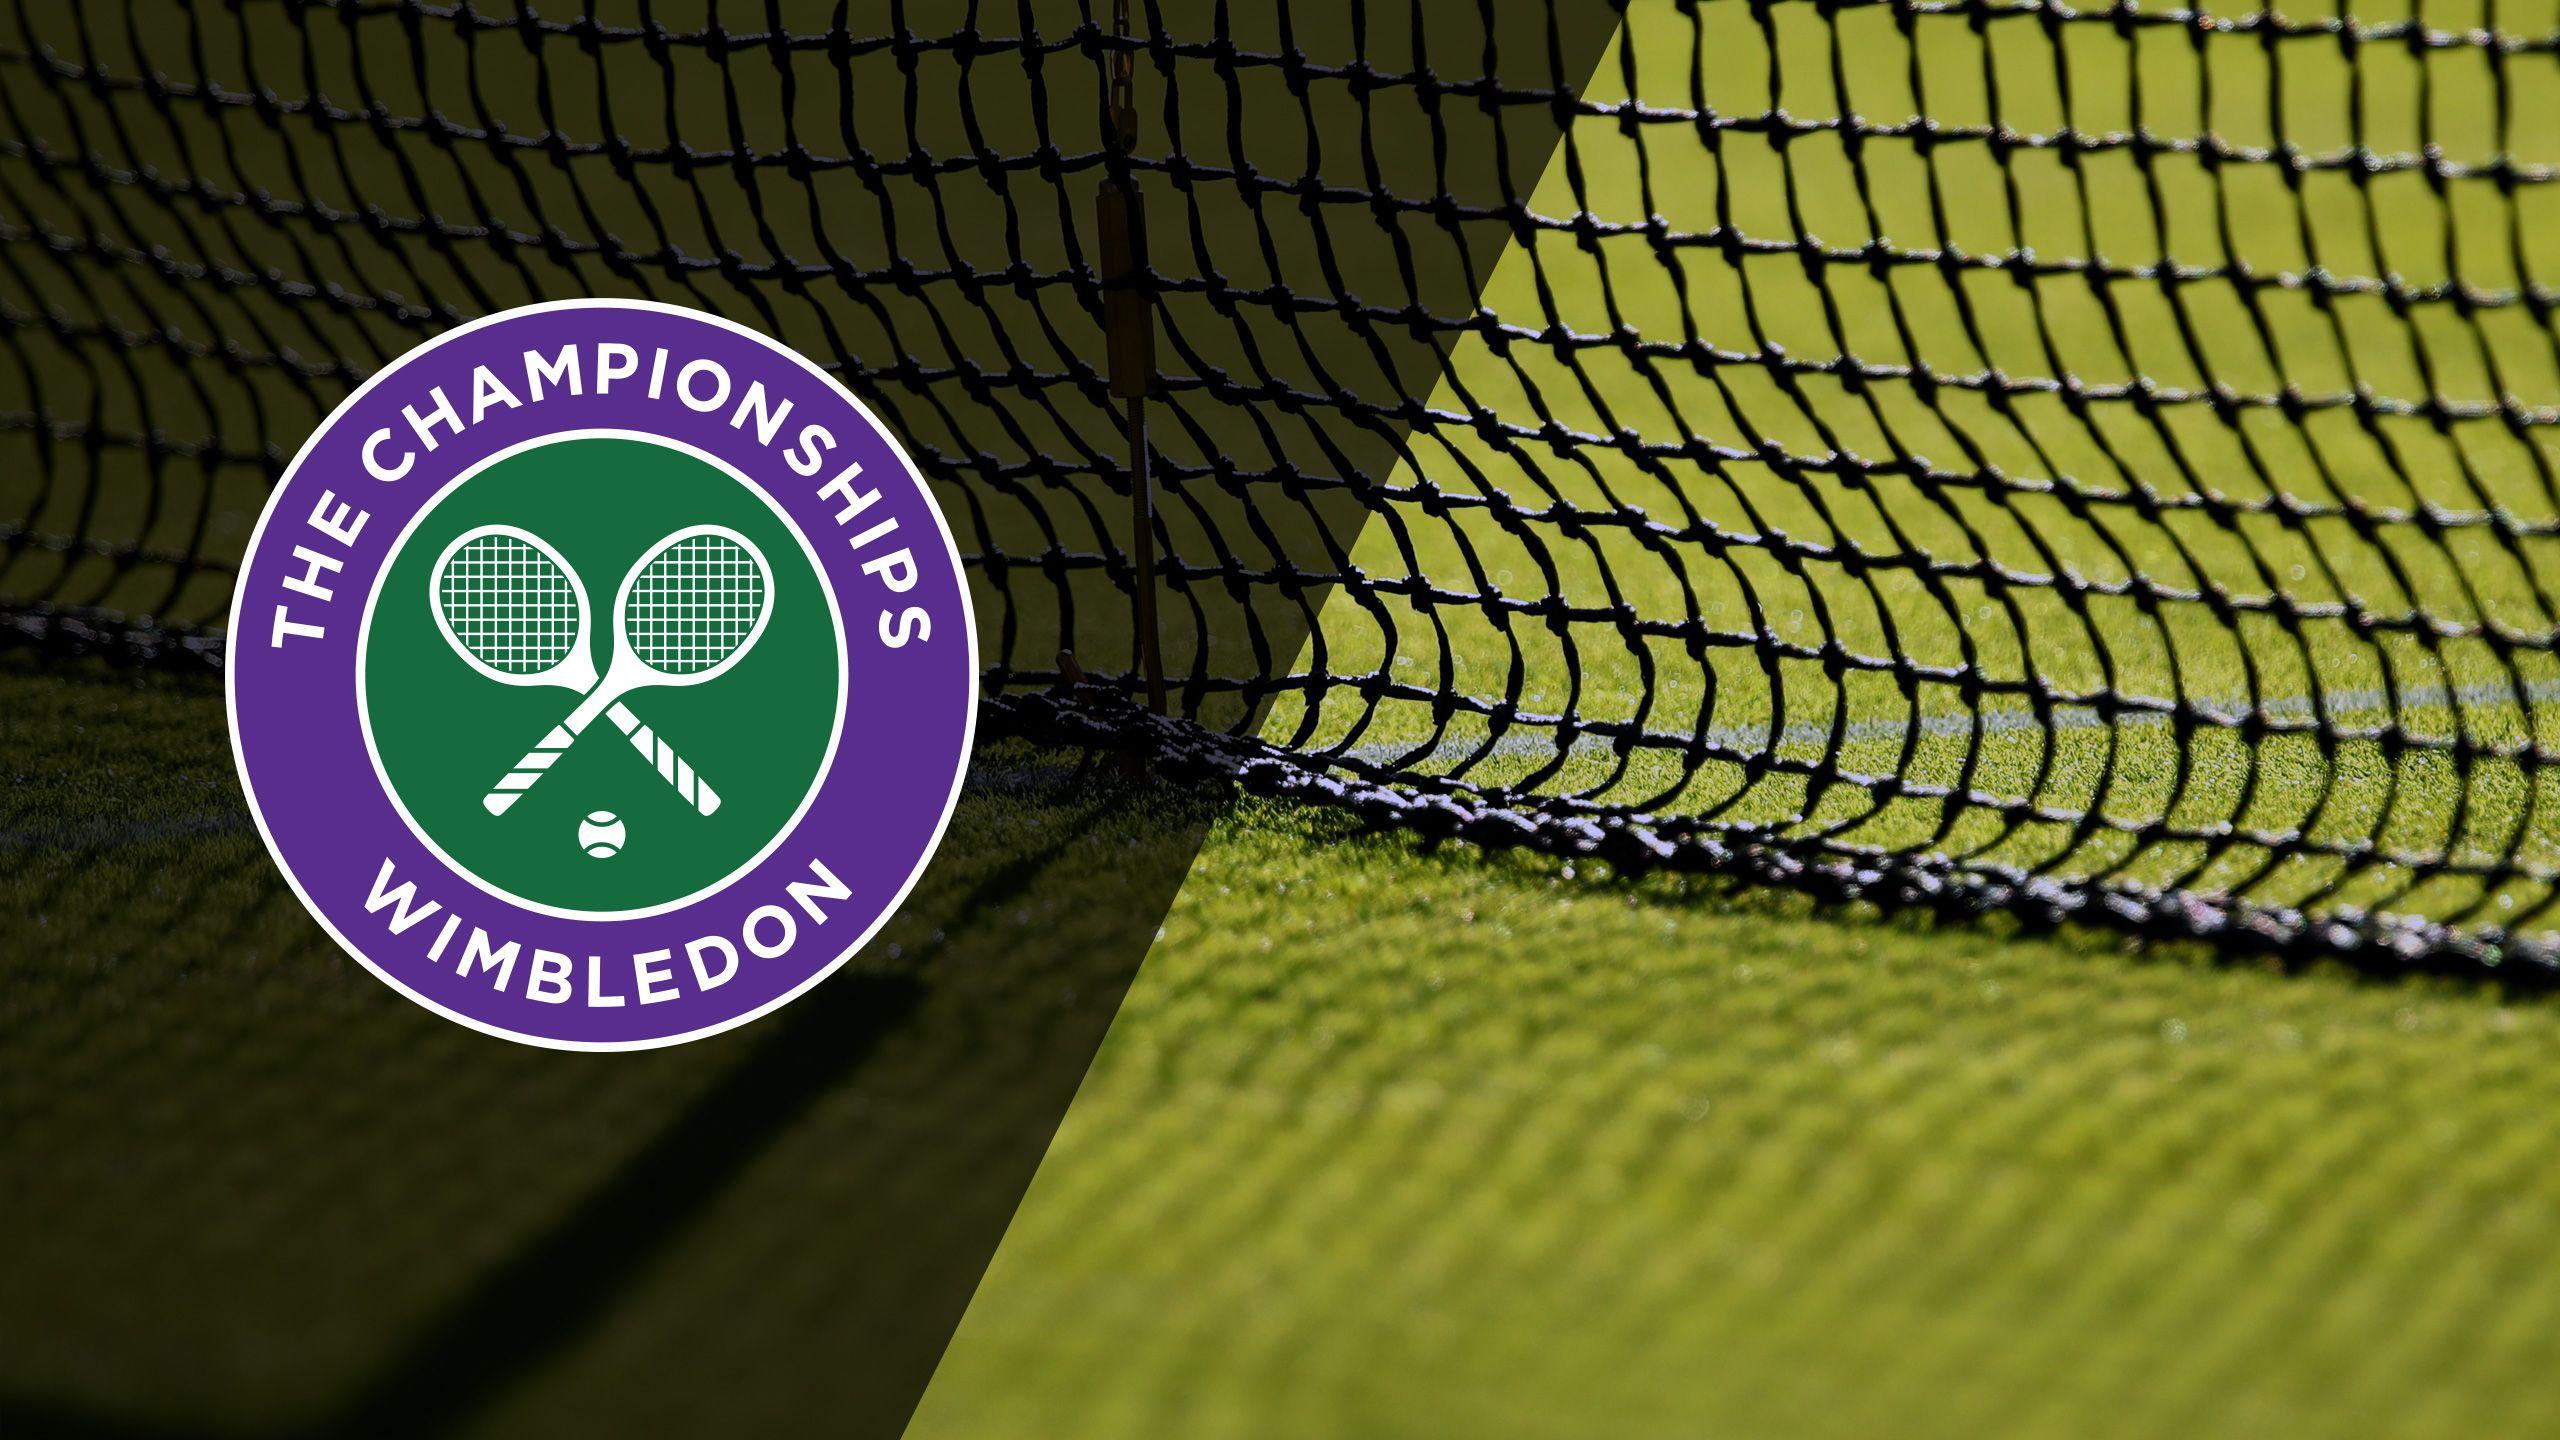 The Championships, Wimbledon 2018 (Encore Pres. - Gentlemen's Championship)